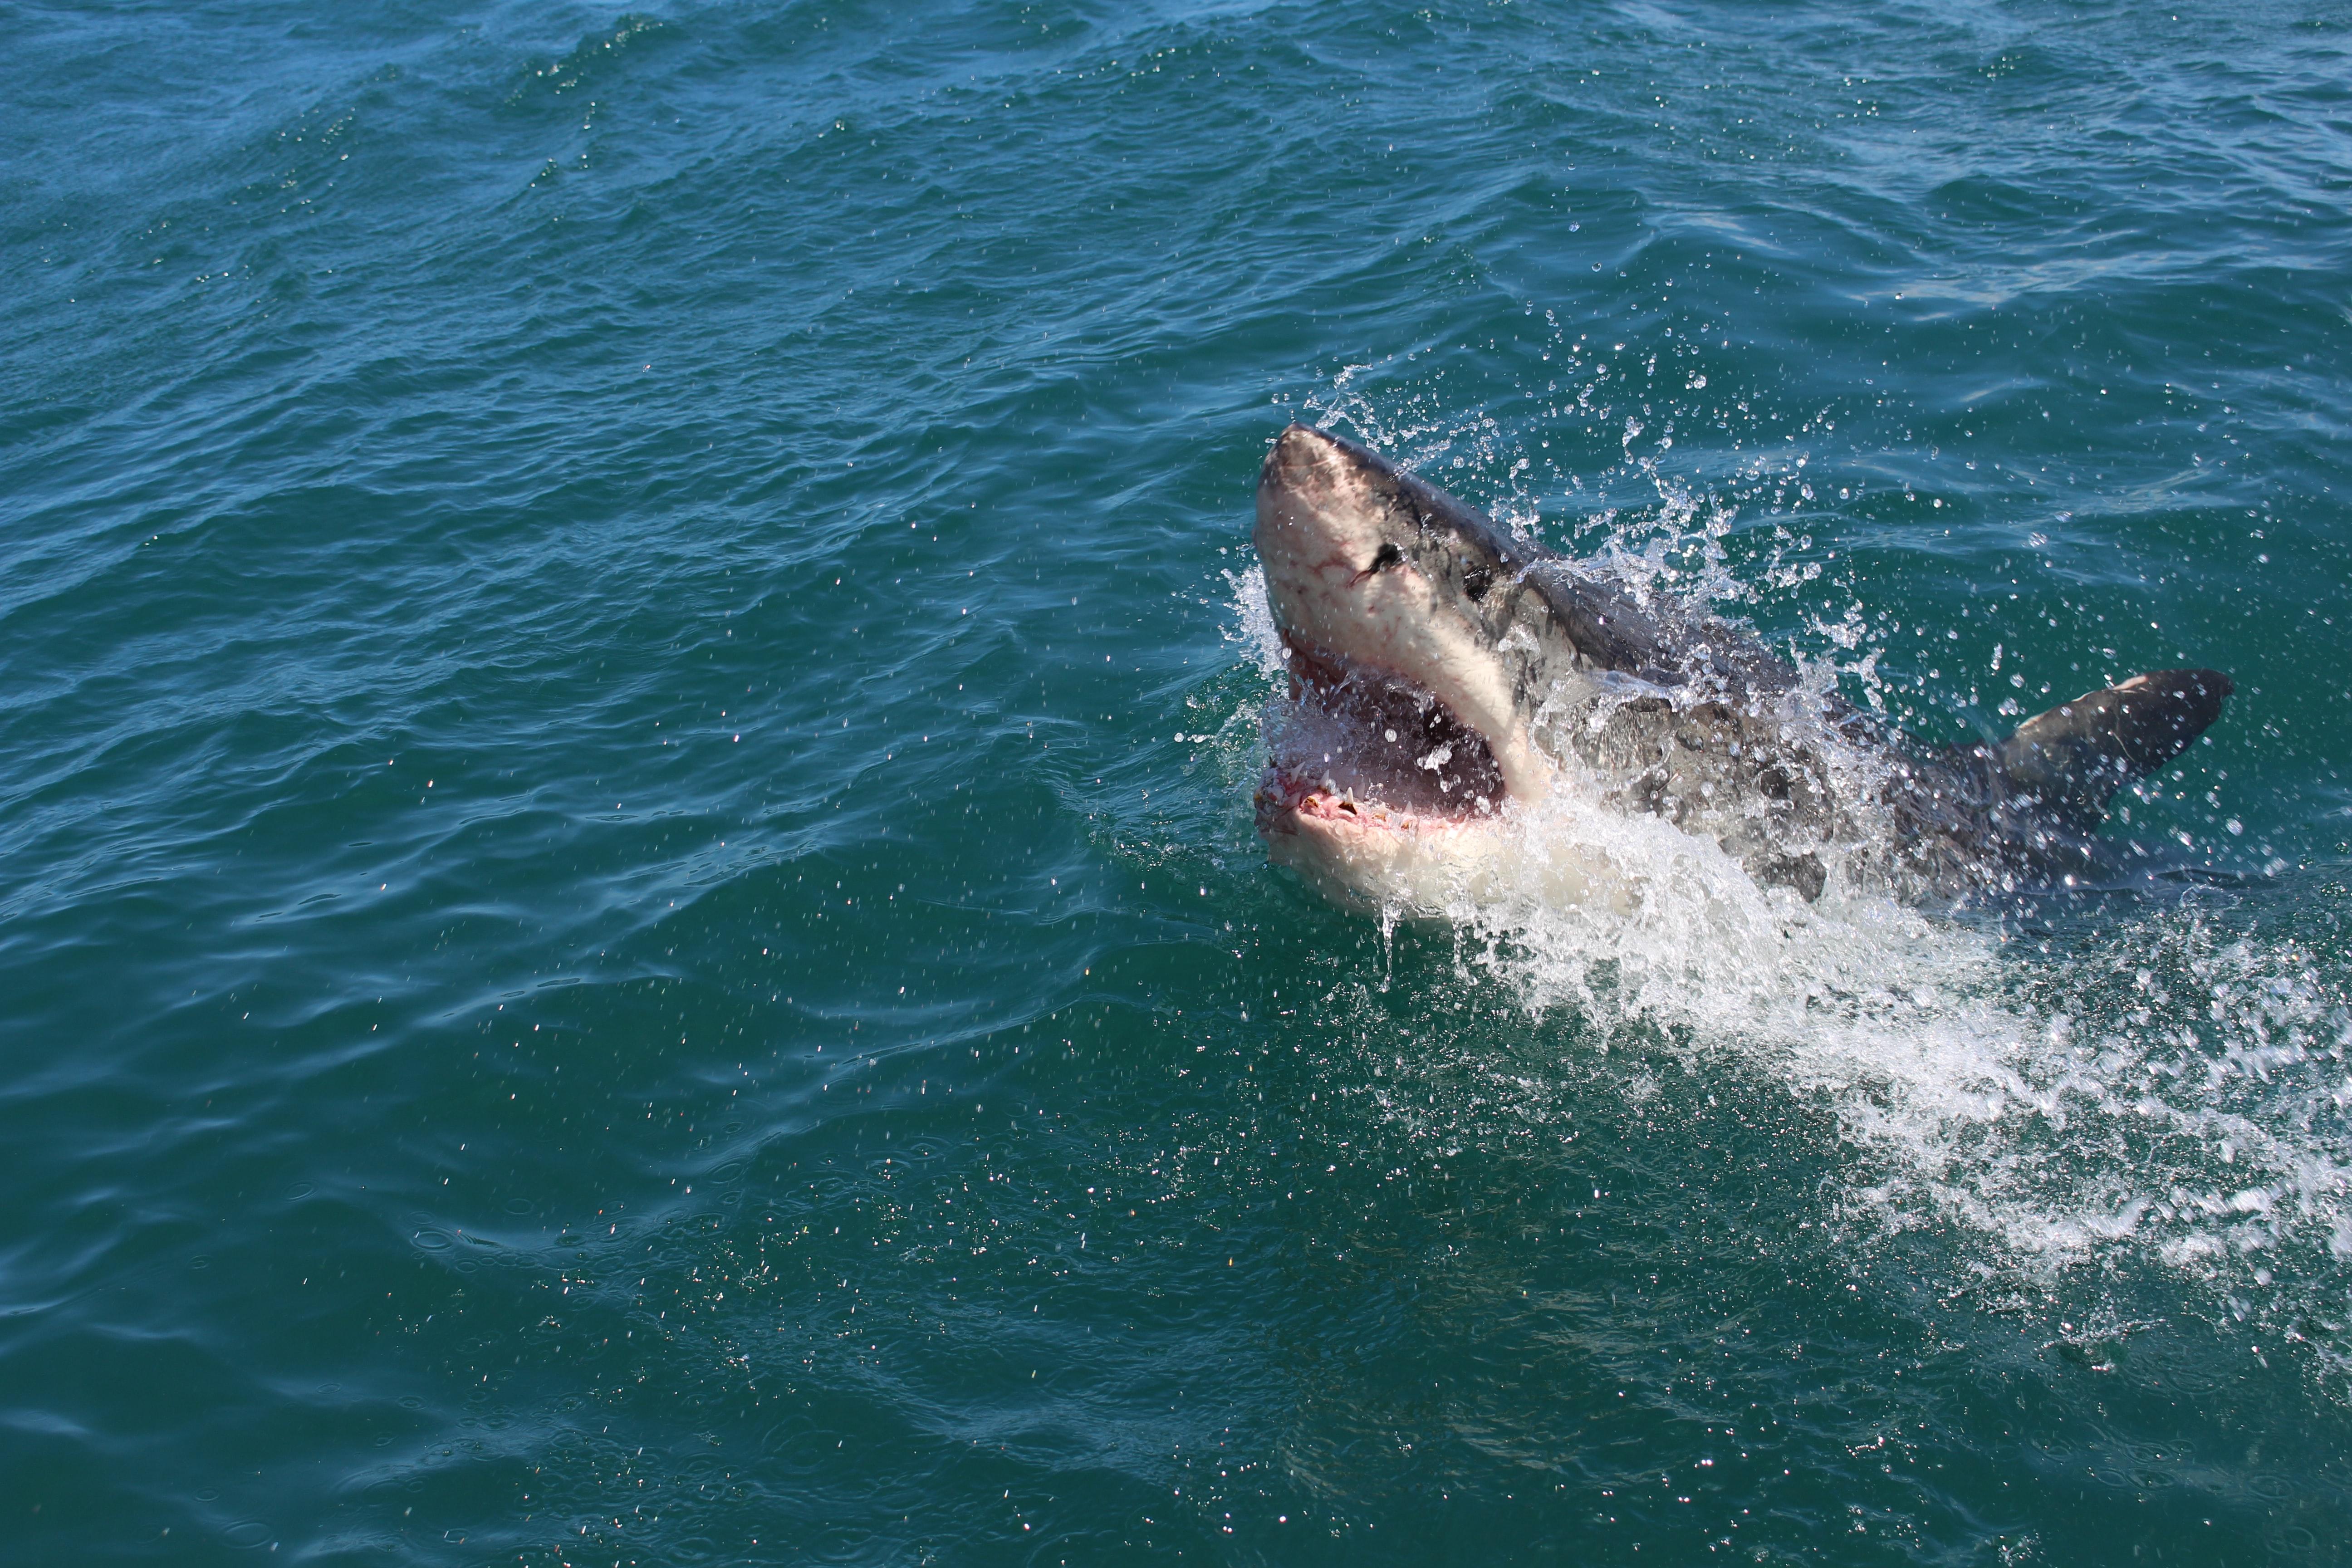 Trump Jumps the Shark